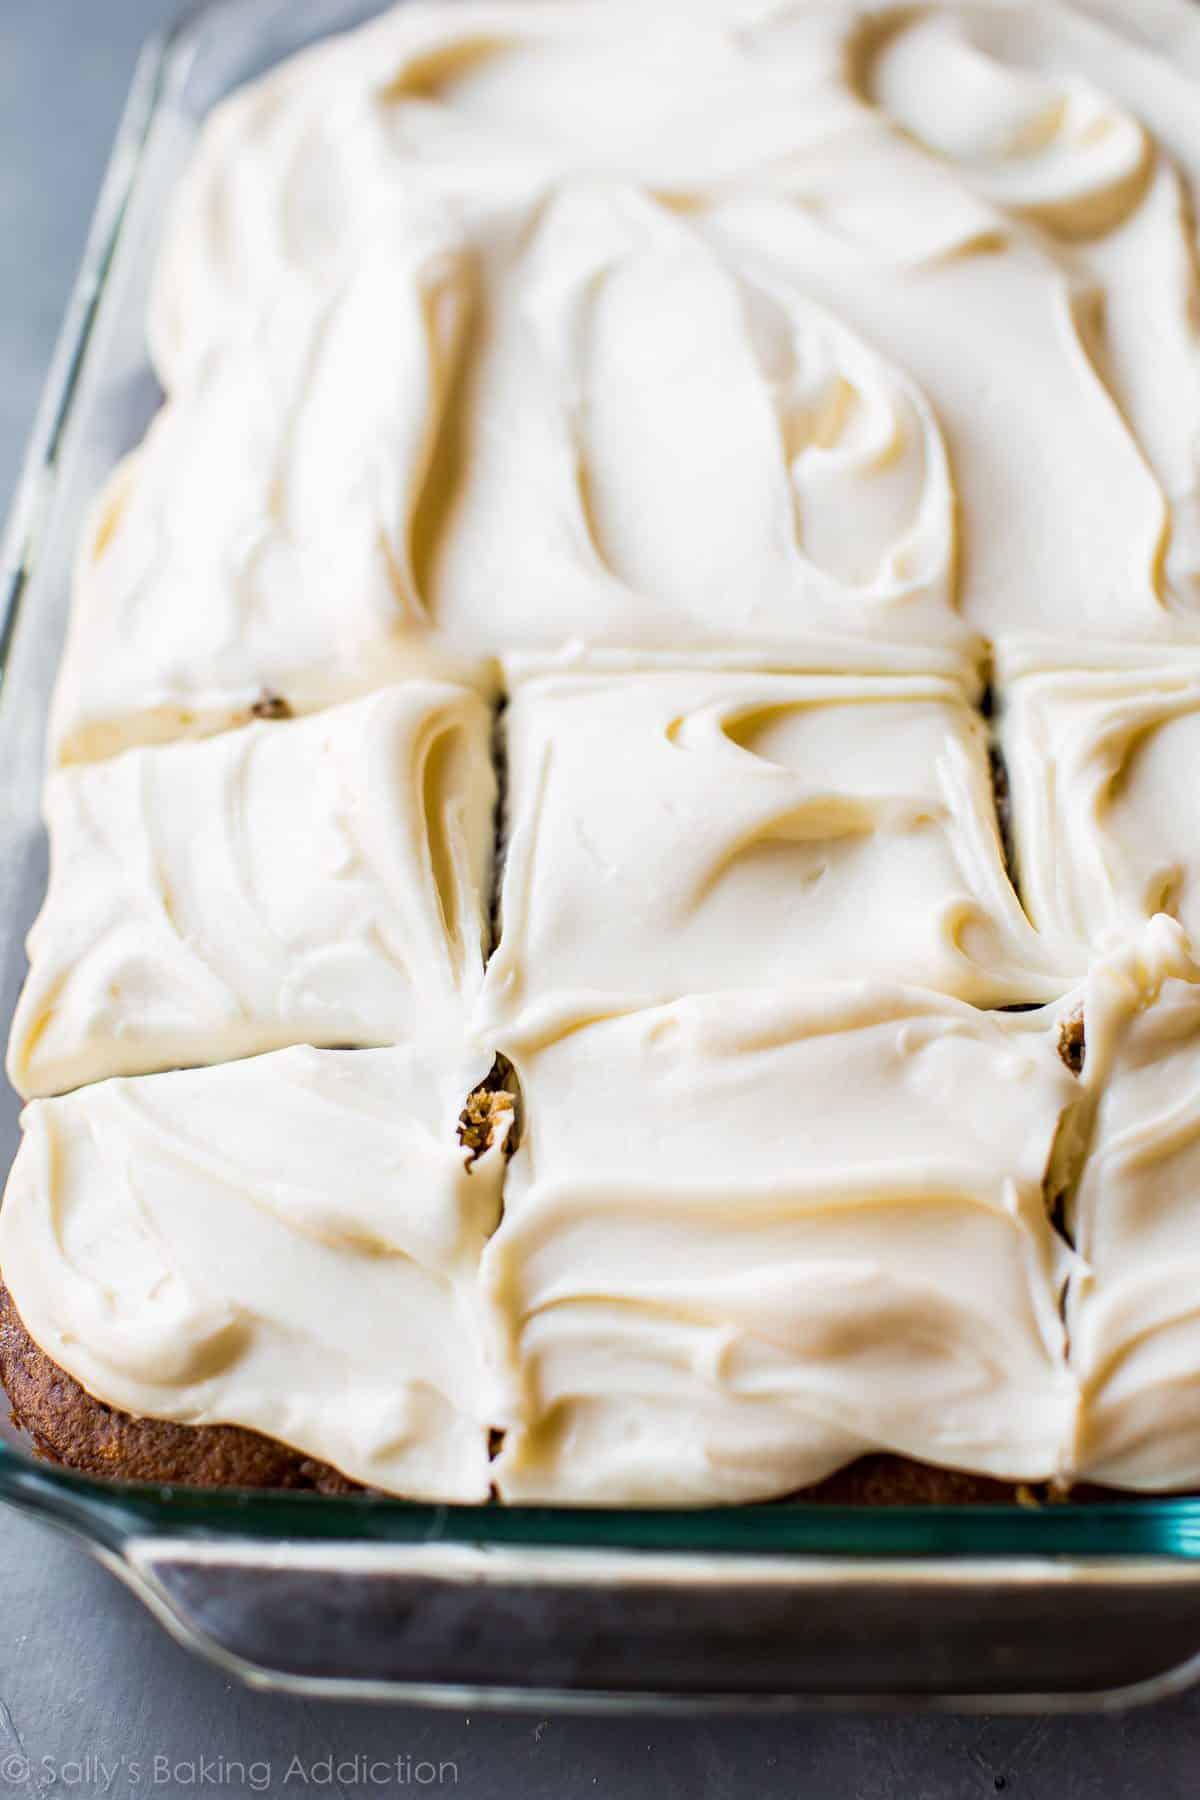 Carrot Cake Recipes Using Spice Cake Mix